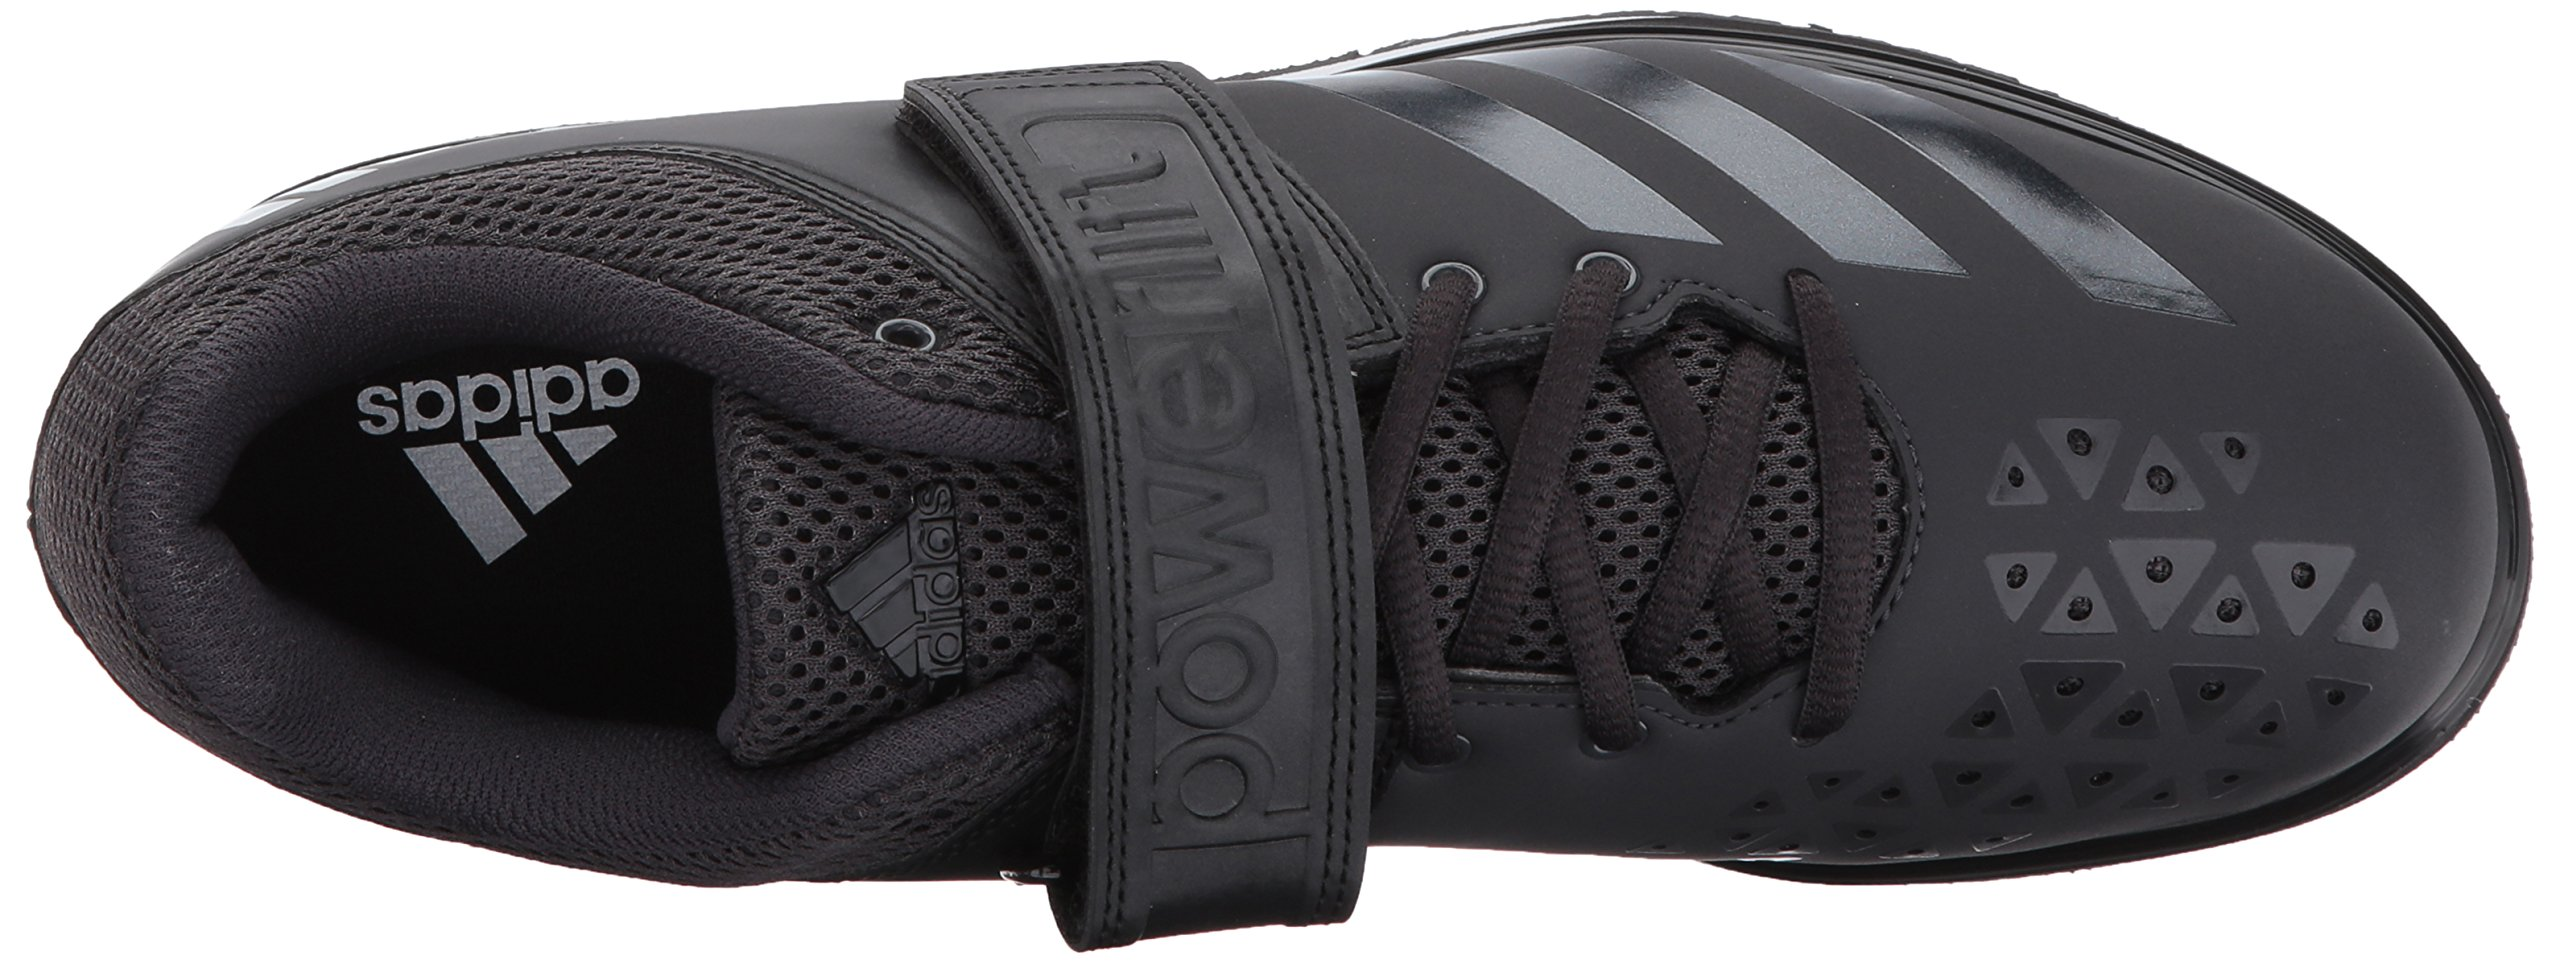 69f2da10decc19 adidas Men s Powerlift.3.1 Cross-Trainer Shoes Utility Black White ...